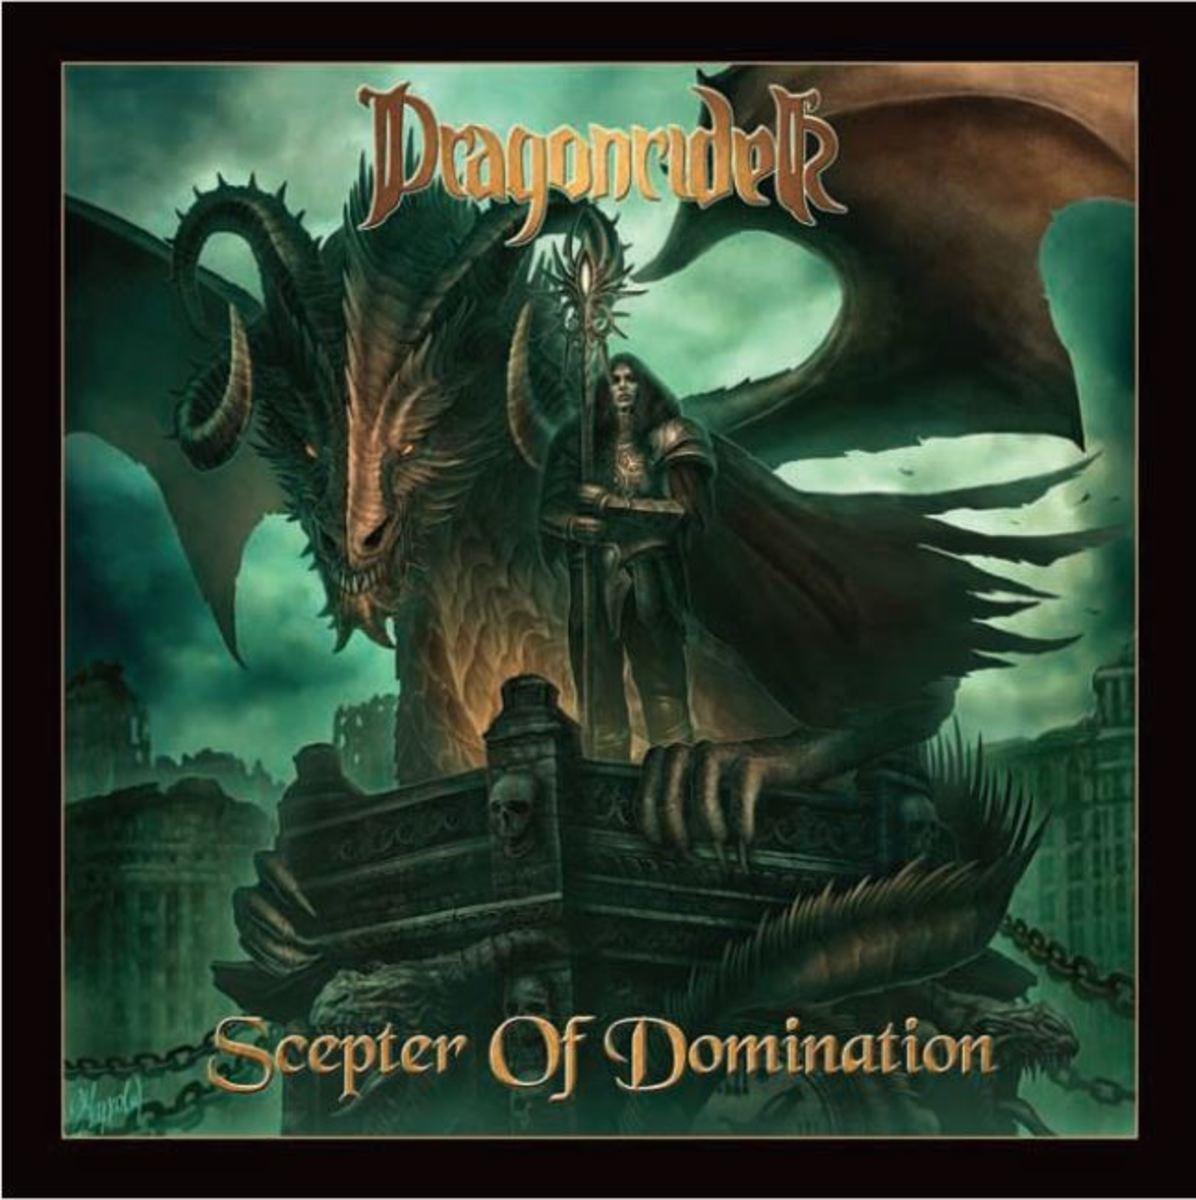 Dragonrider,